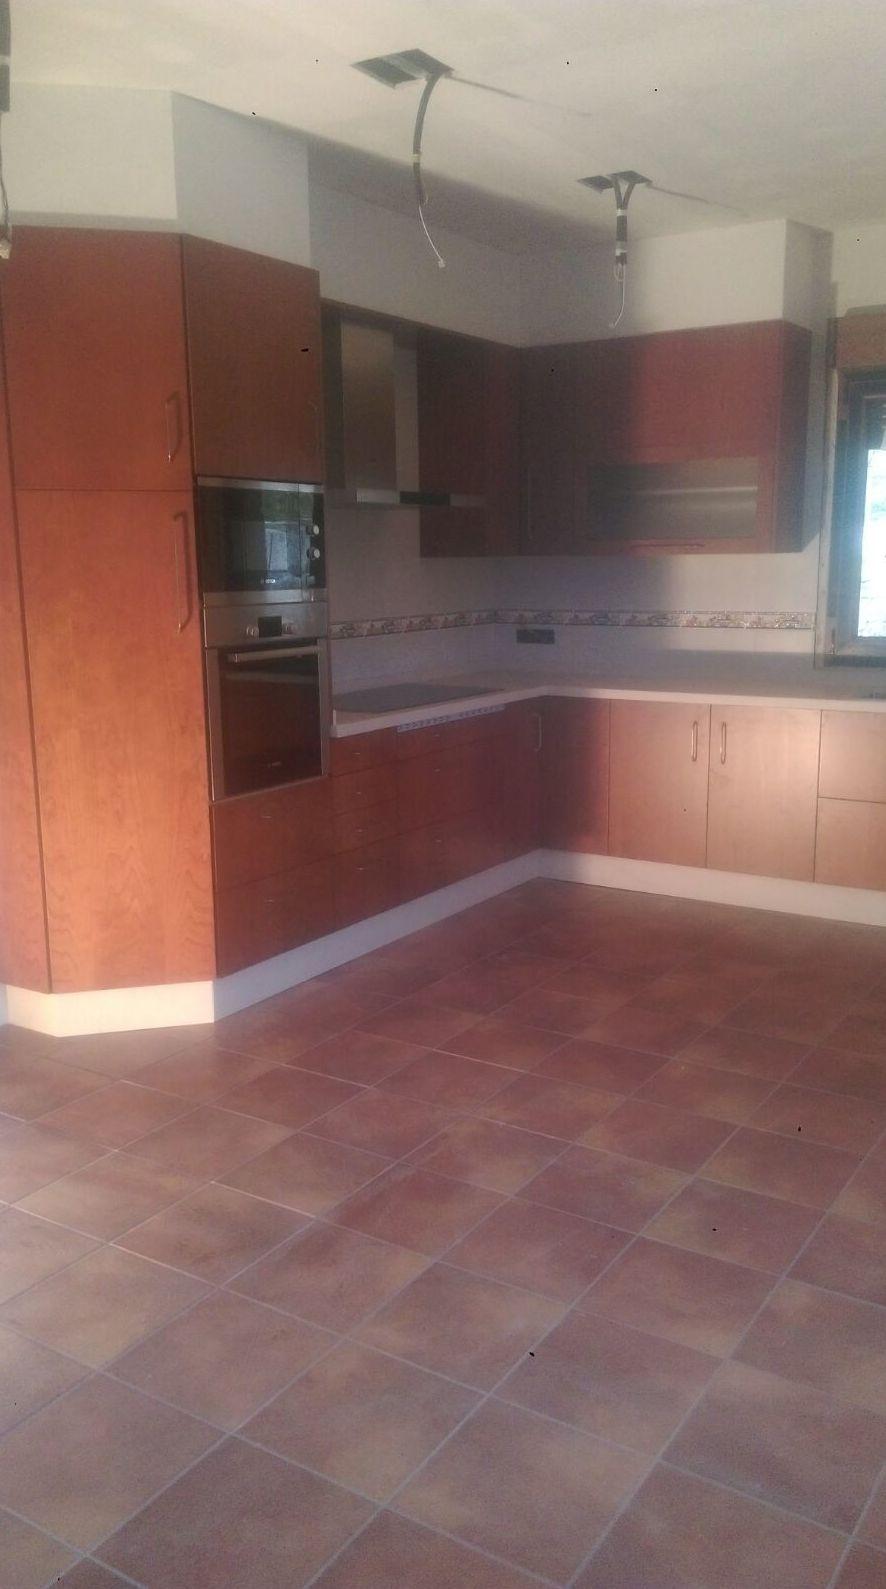 Imilk.info = liquidacion muebles de cocina pontevedra ...